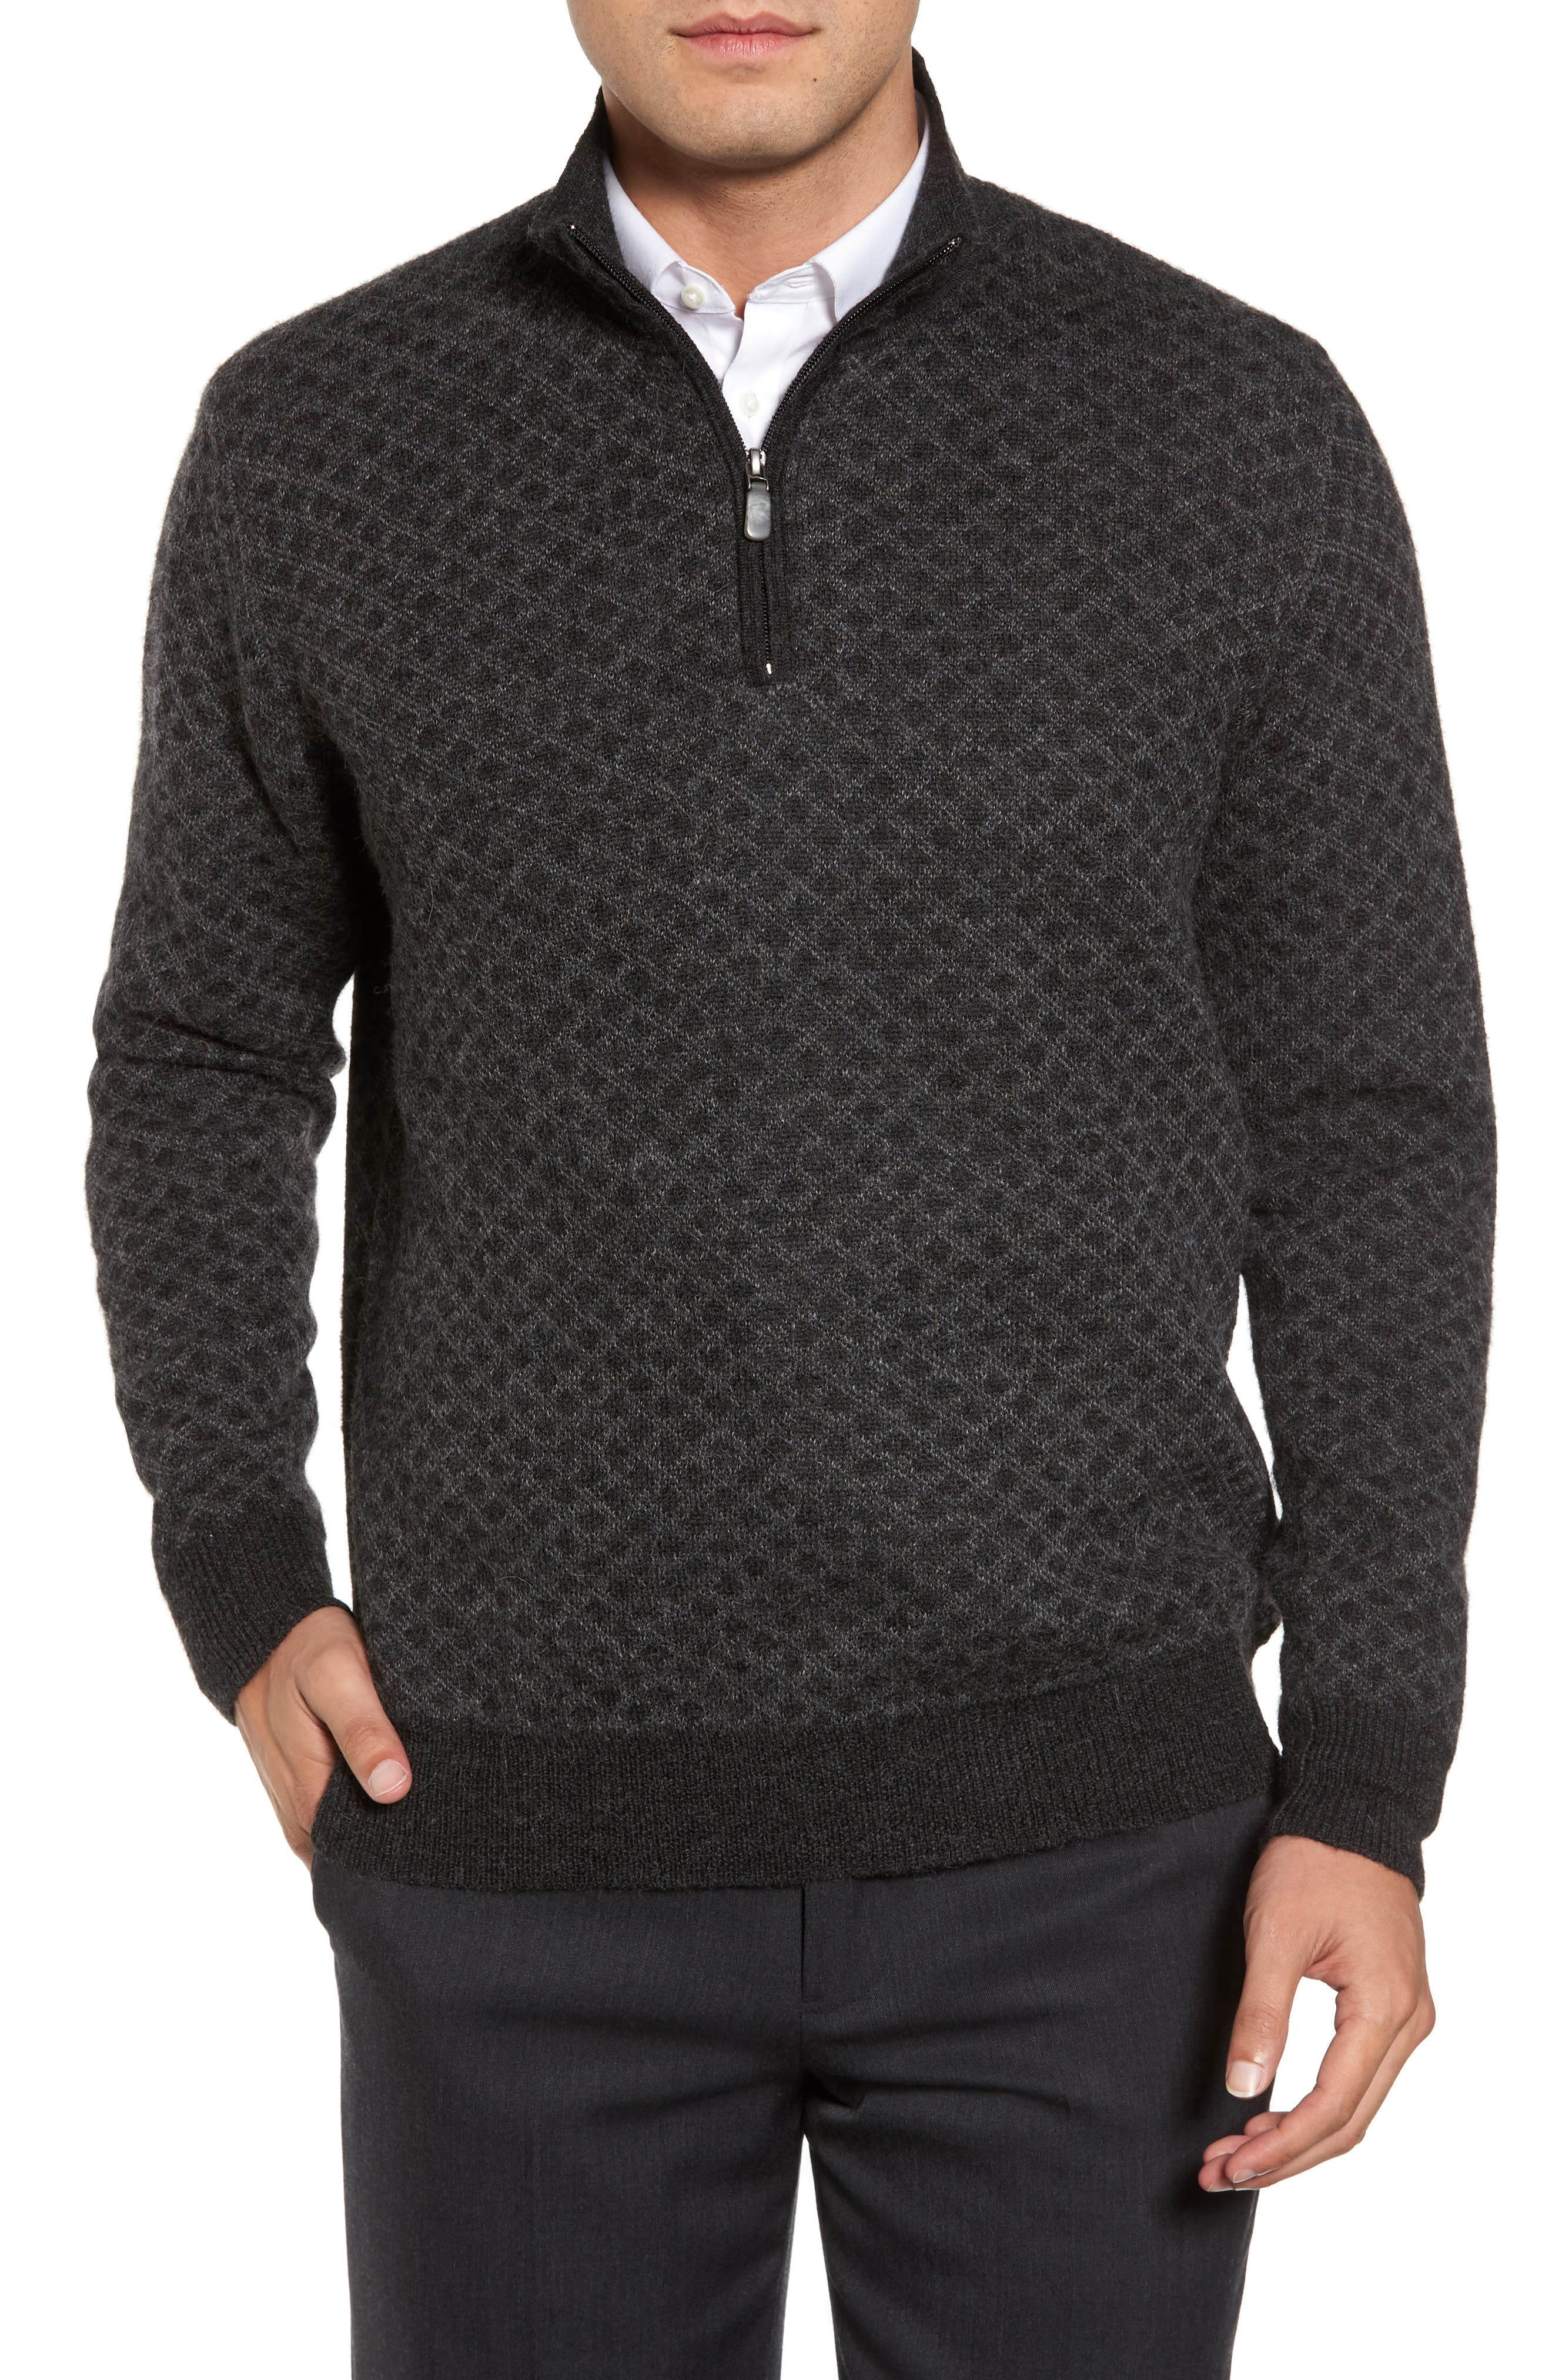 Diamond Quarter Zip Alpaca Sweater,                             Main thumbnail 1, color,                             020